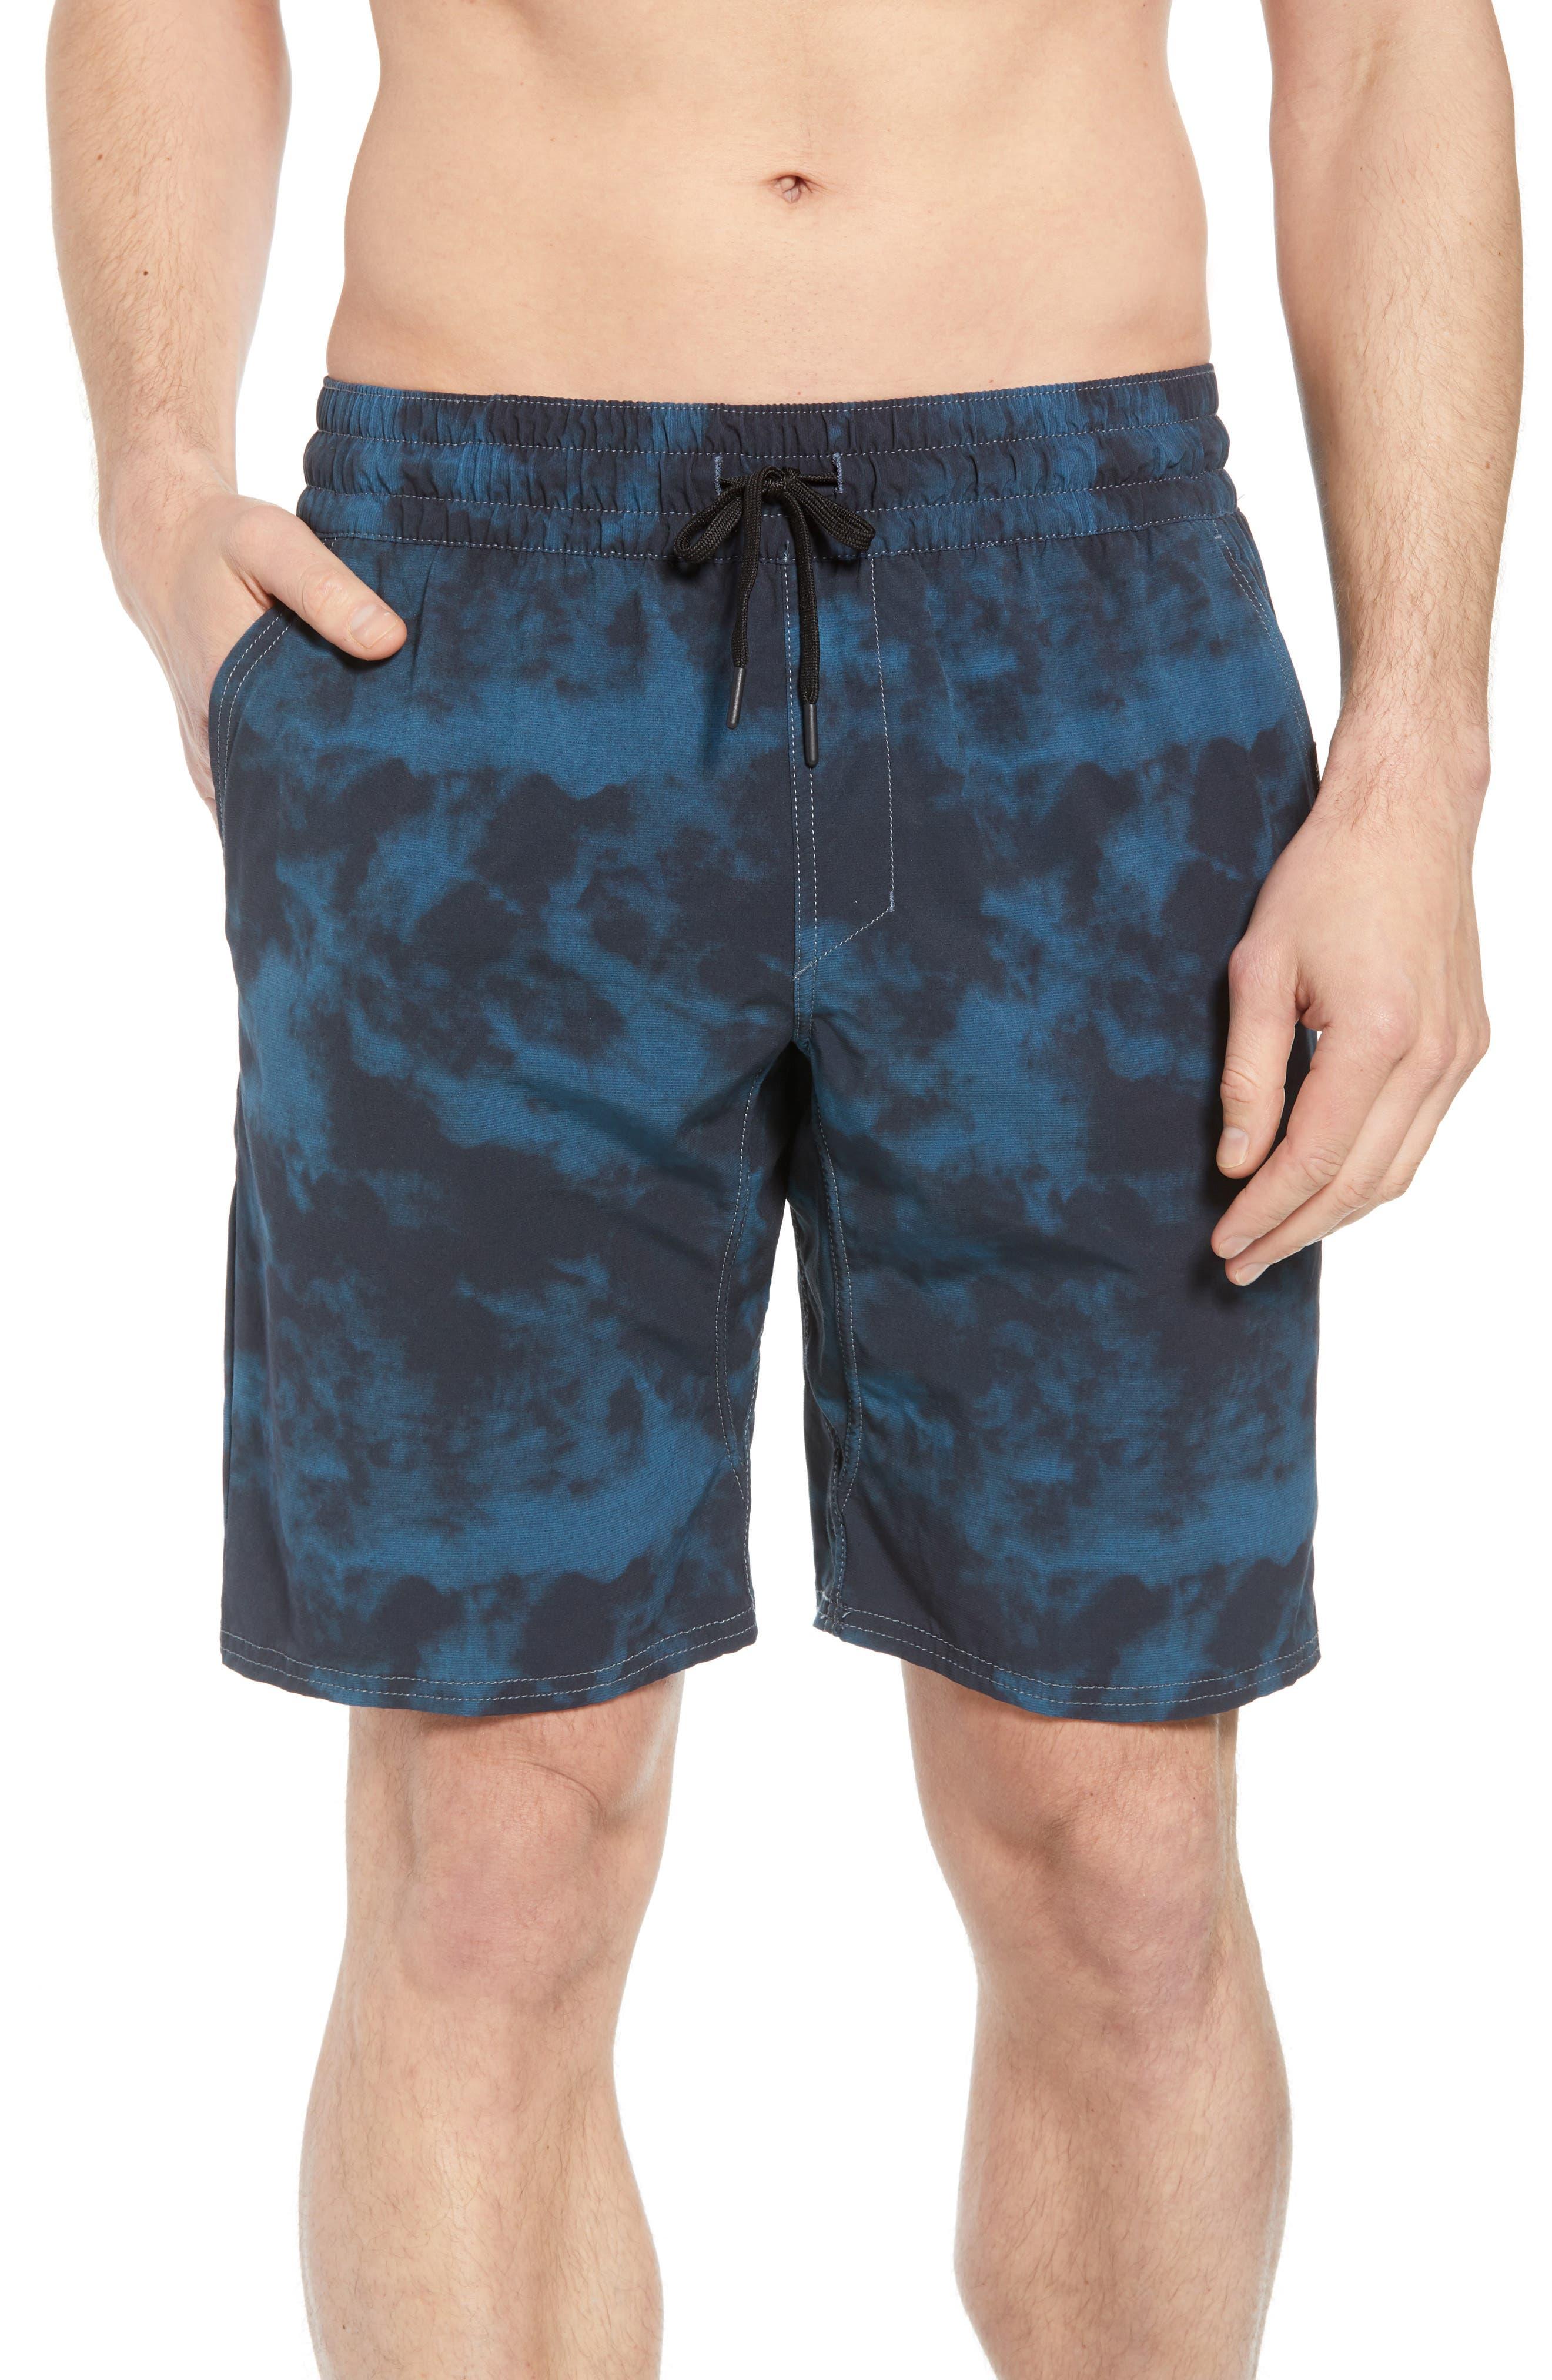 Destination Board Shorts,                             Main thumbnail 1, color,                             OCEAN WASH